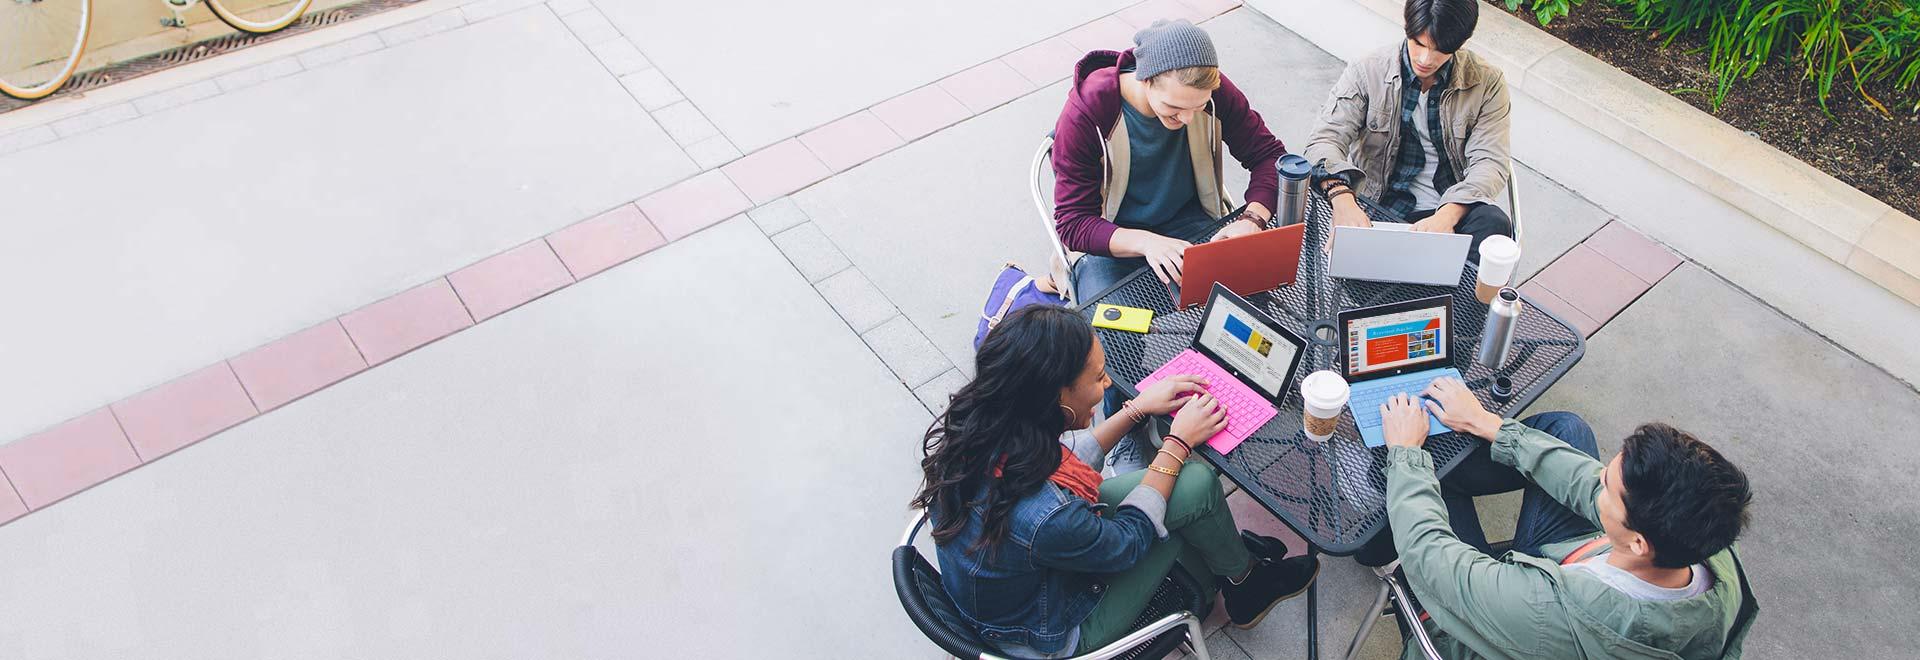 Empat pelajar sedang duduk di meja di luar, menggunakan Office 365 untuk Pendidikan pada tablet.